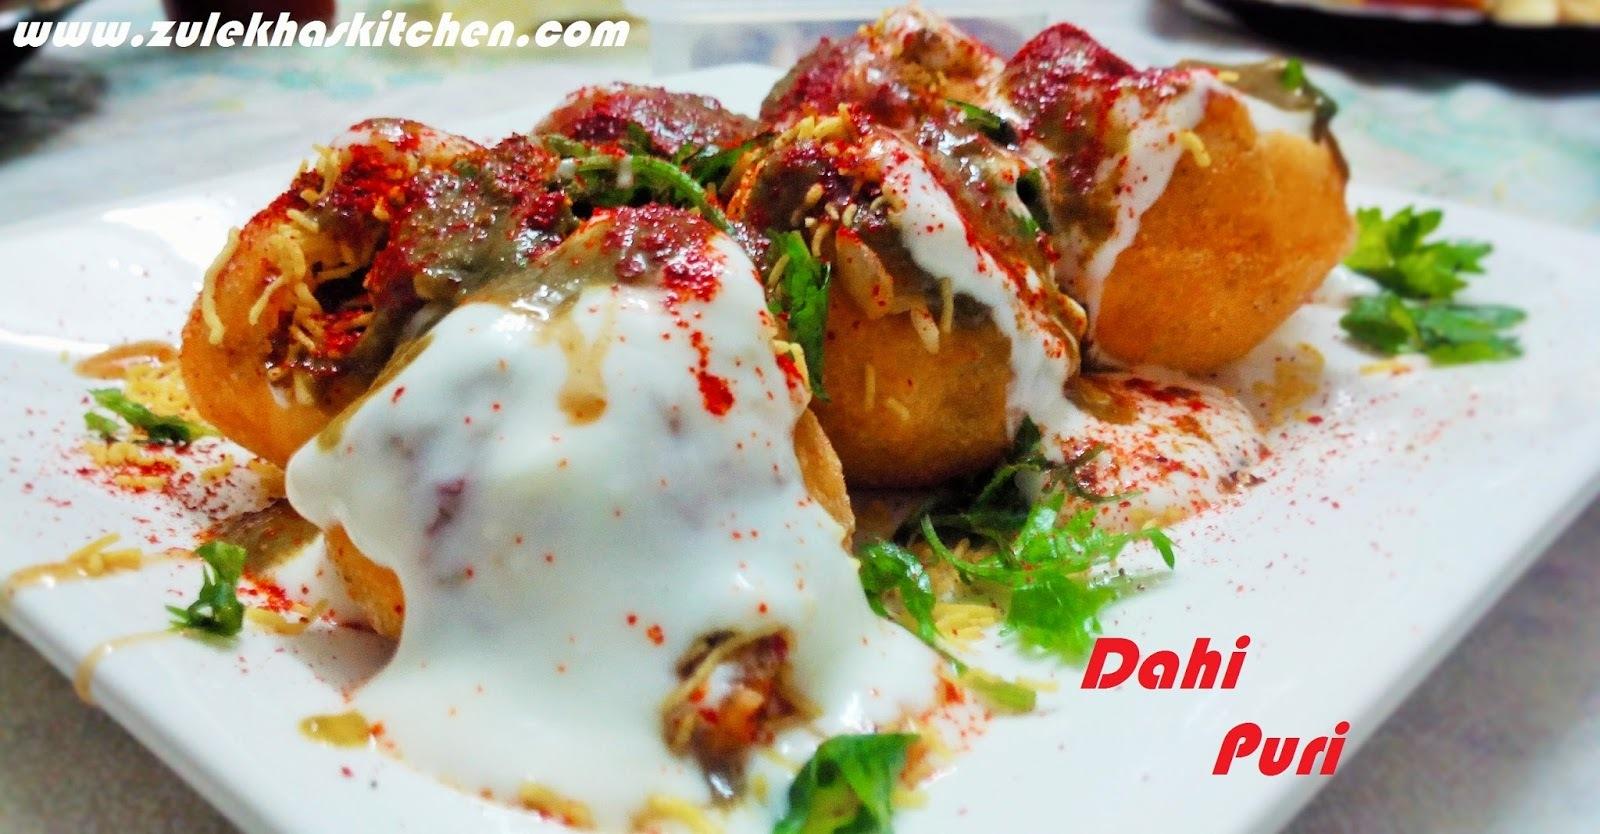 Recipe of Dahi Batata Puri